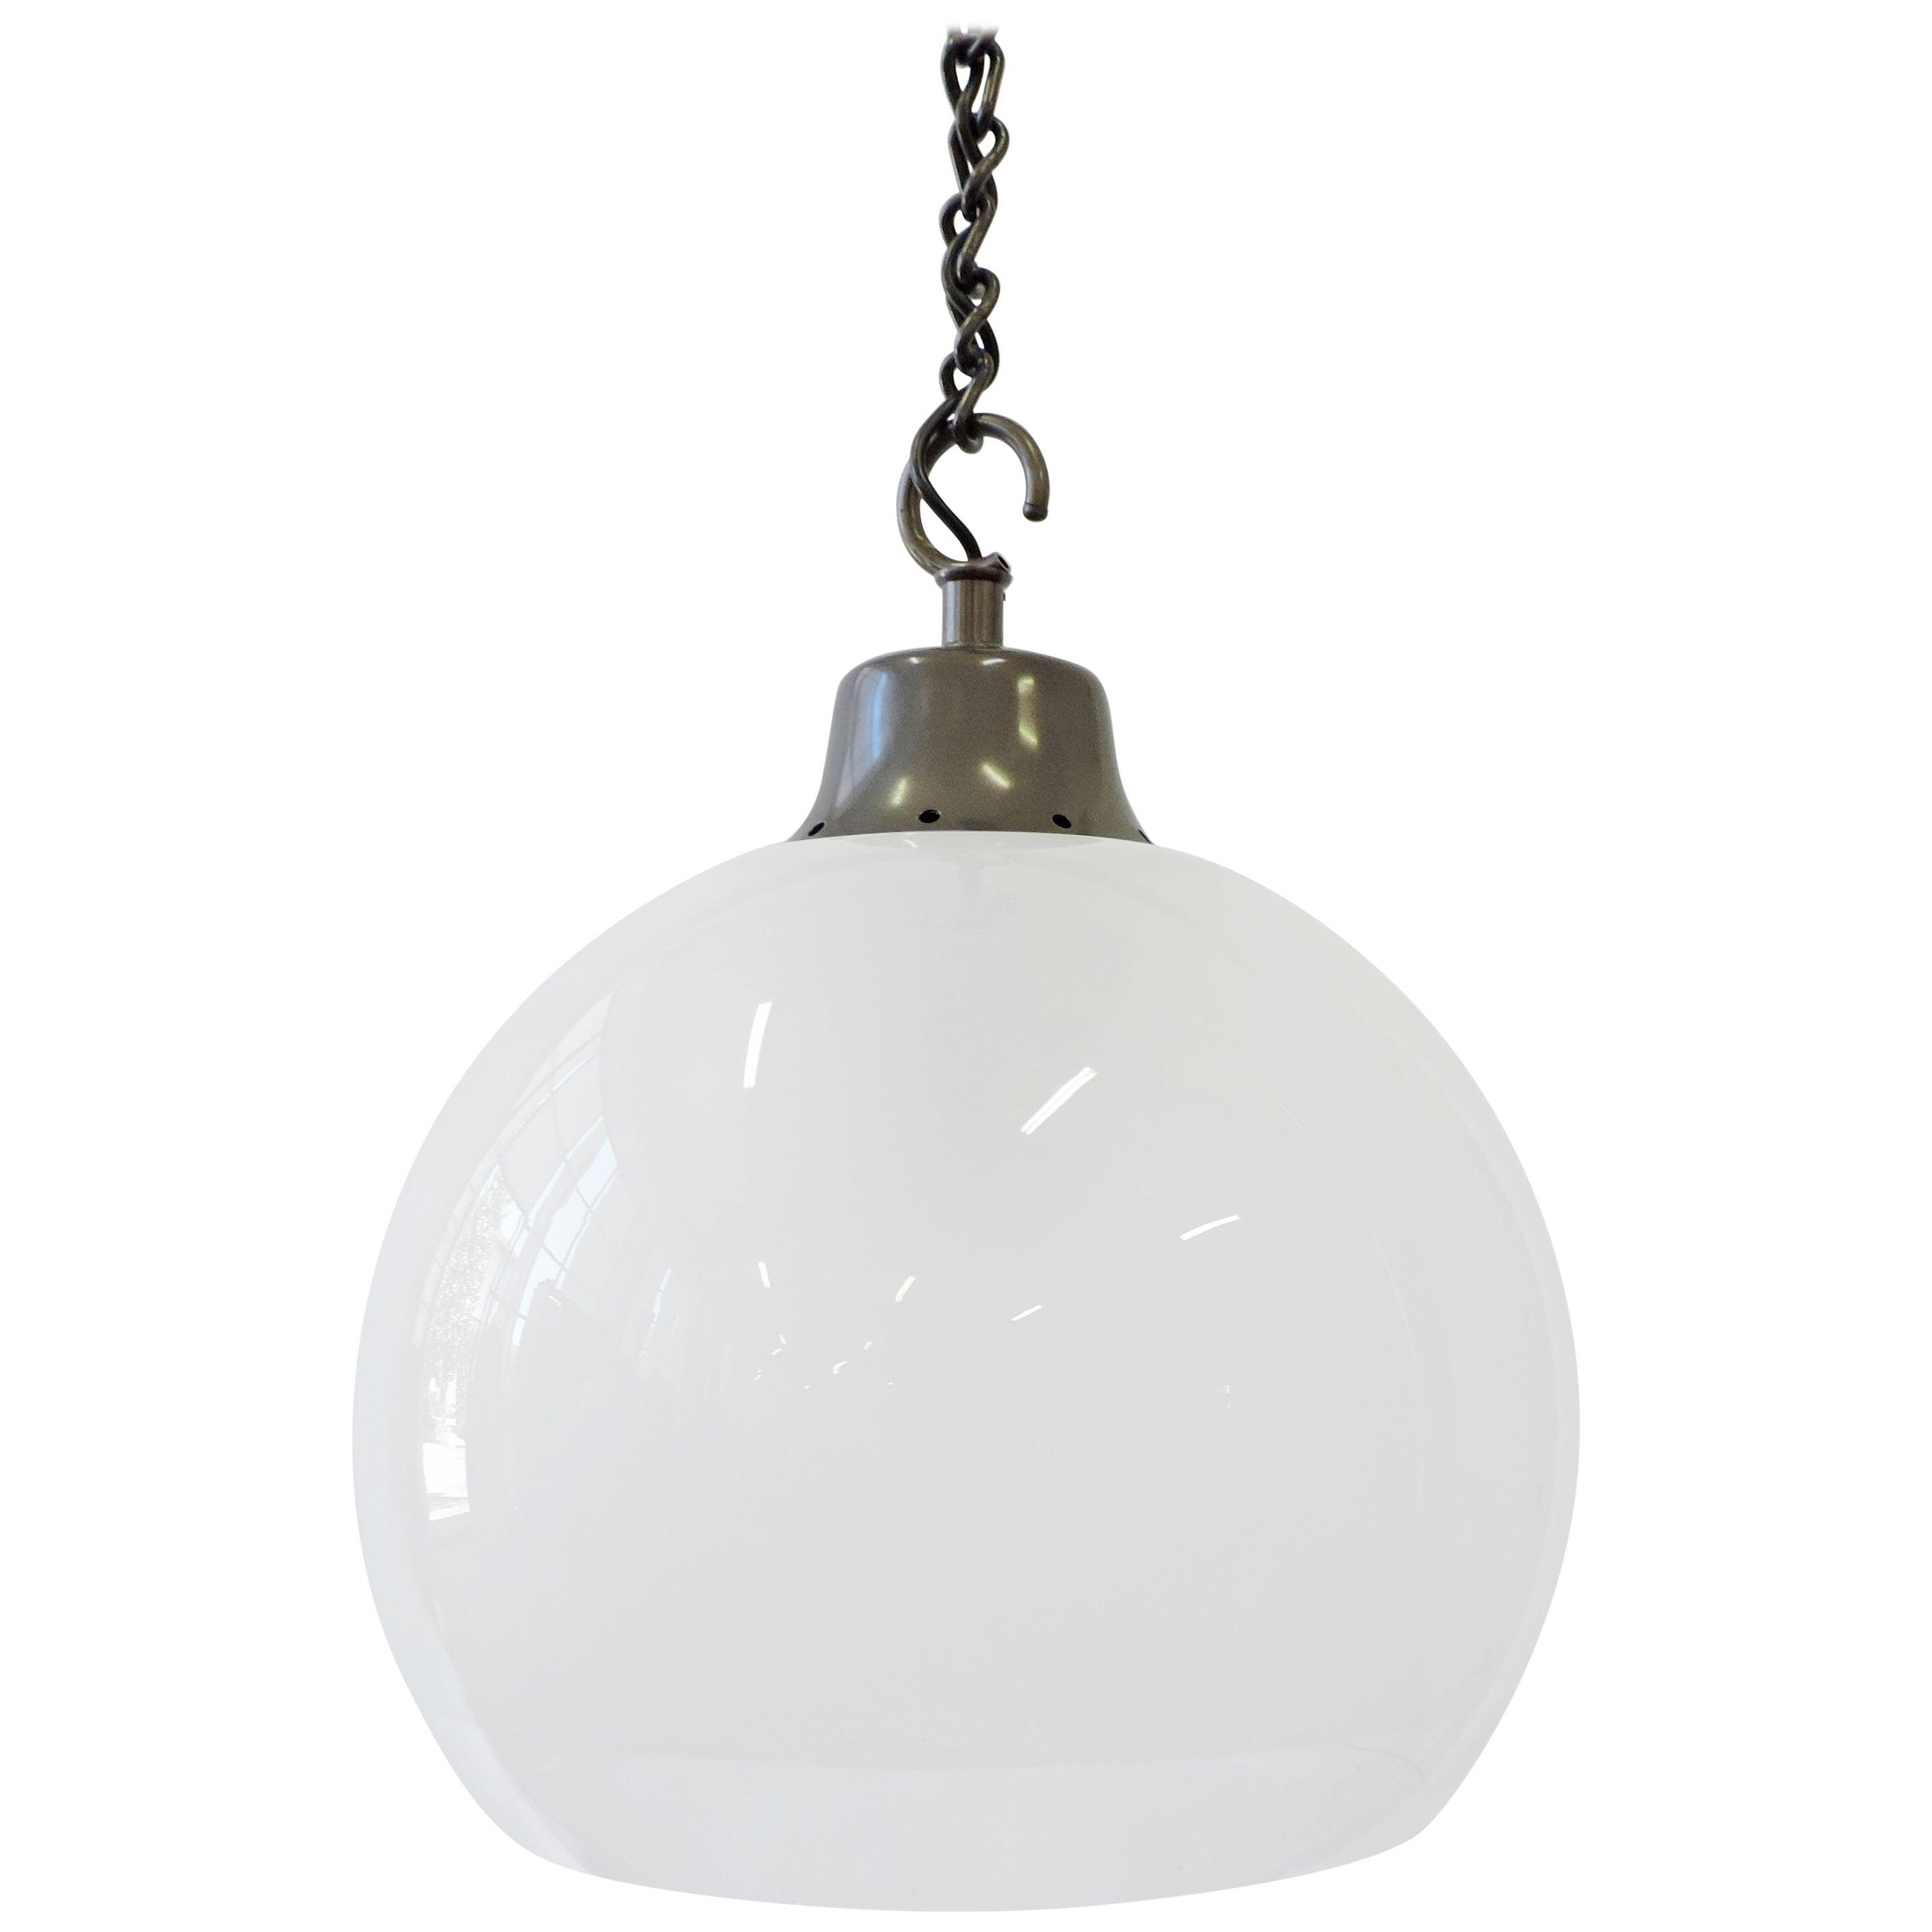 Luigi Caccia Dominioni LS10 Ceiling Lamp for Azucena, Italy, 1960s